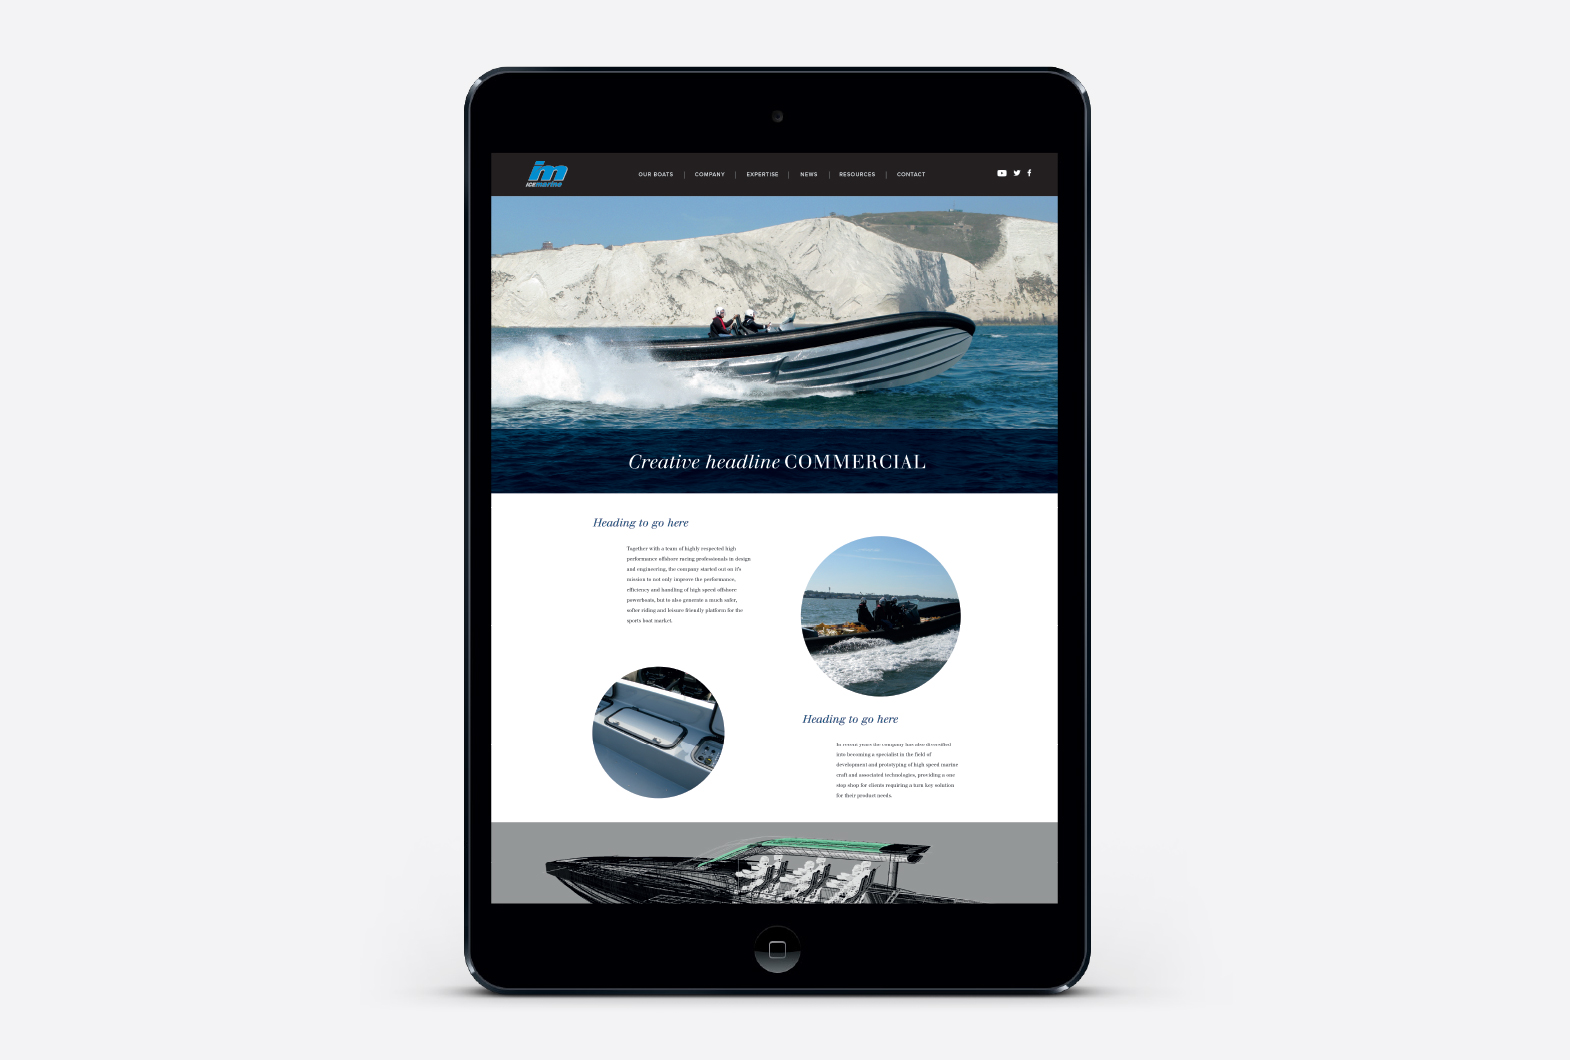 Ice Marine powerboat website design on mobile device